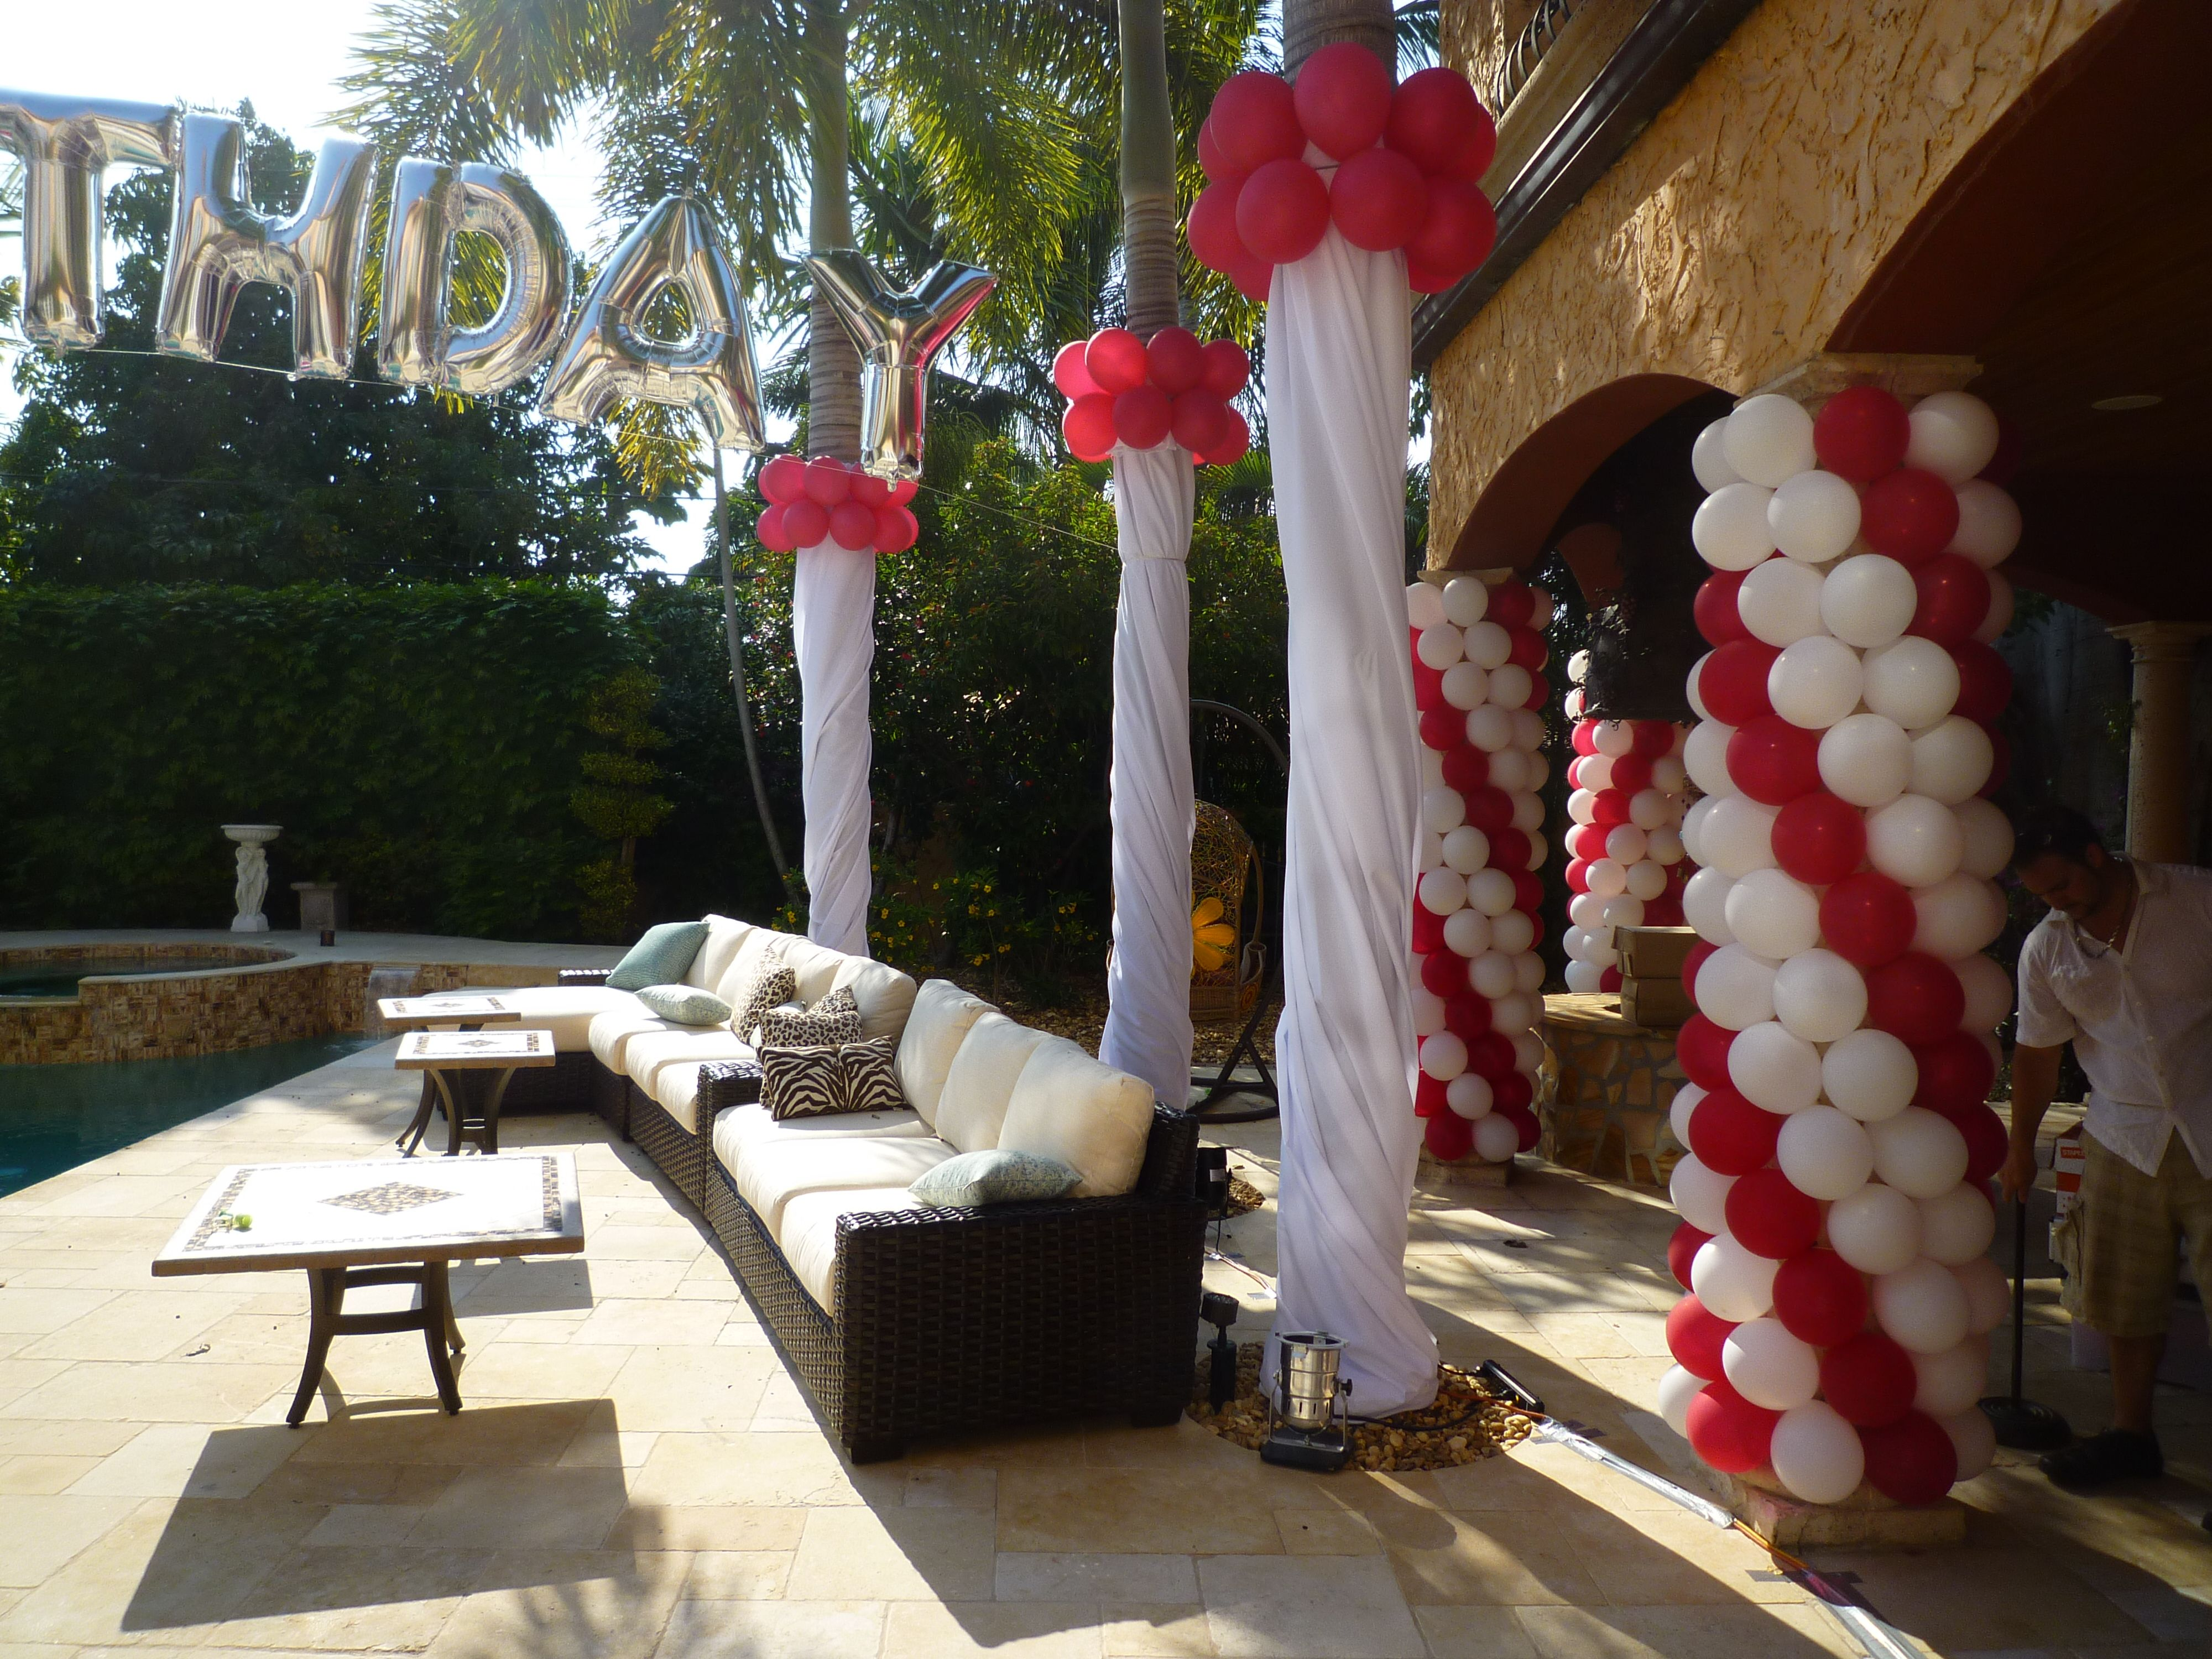 Pillar Wrapping By Balloons Backyard Birthday Party Balloon Decoration Www Dreamarkeven Balloon Decorations Party Backyard Birthday Parties Backyard Birthday